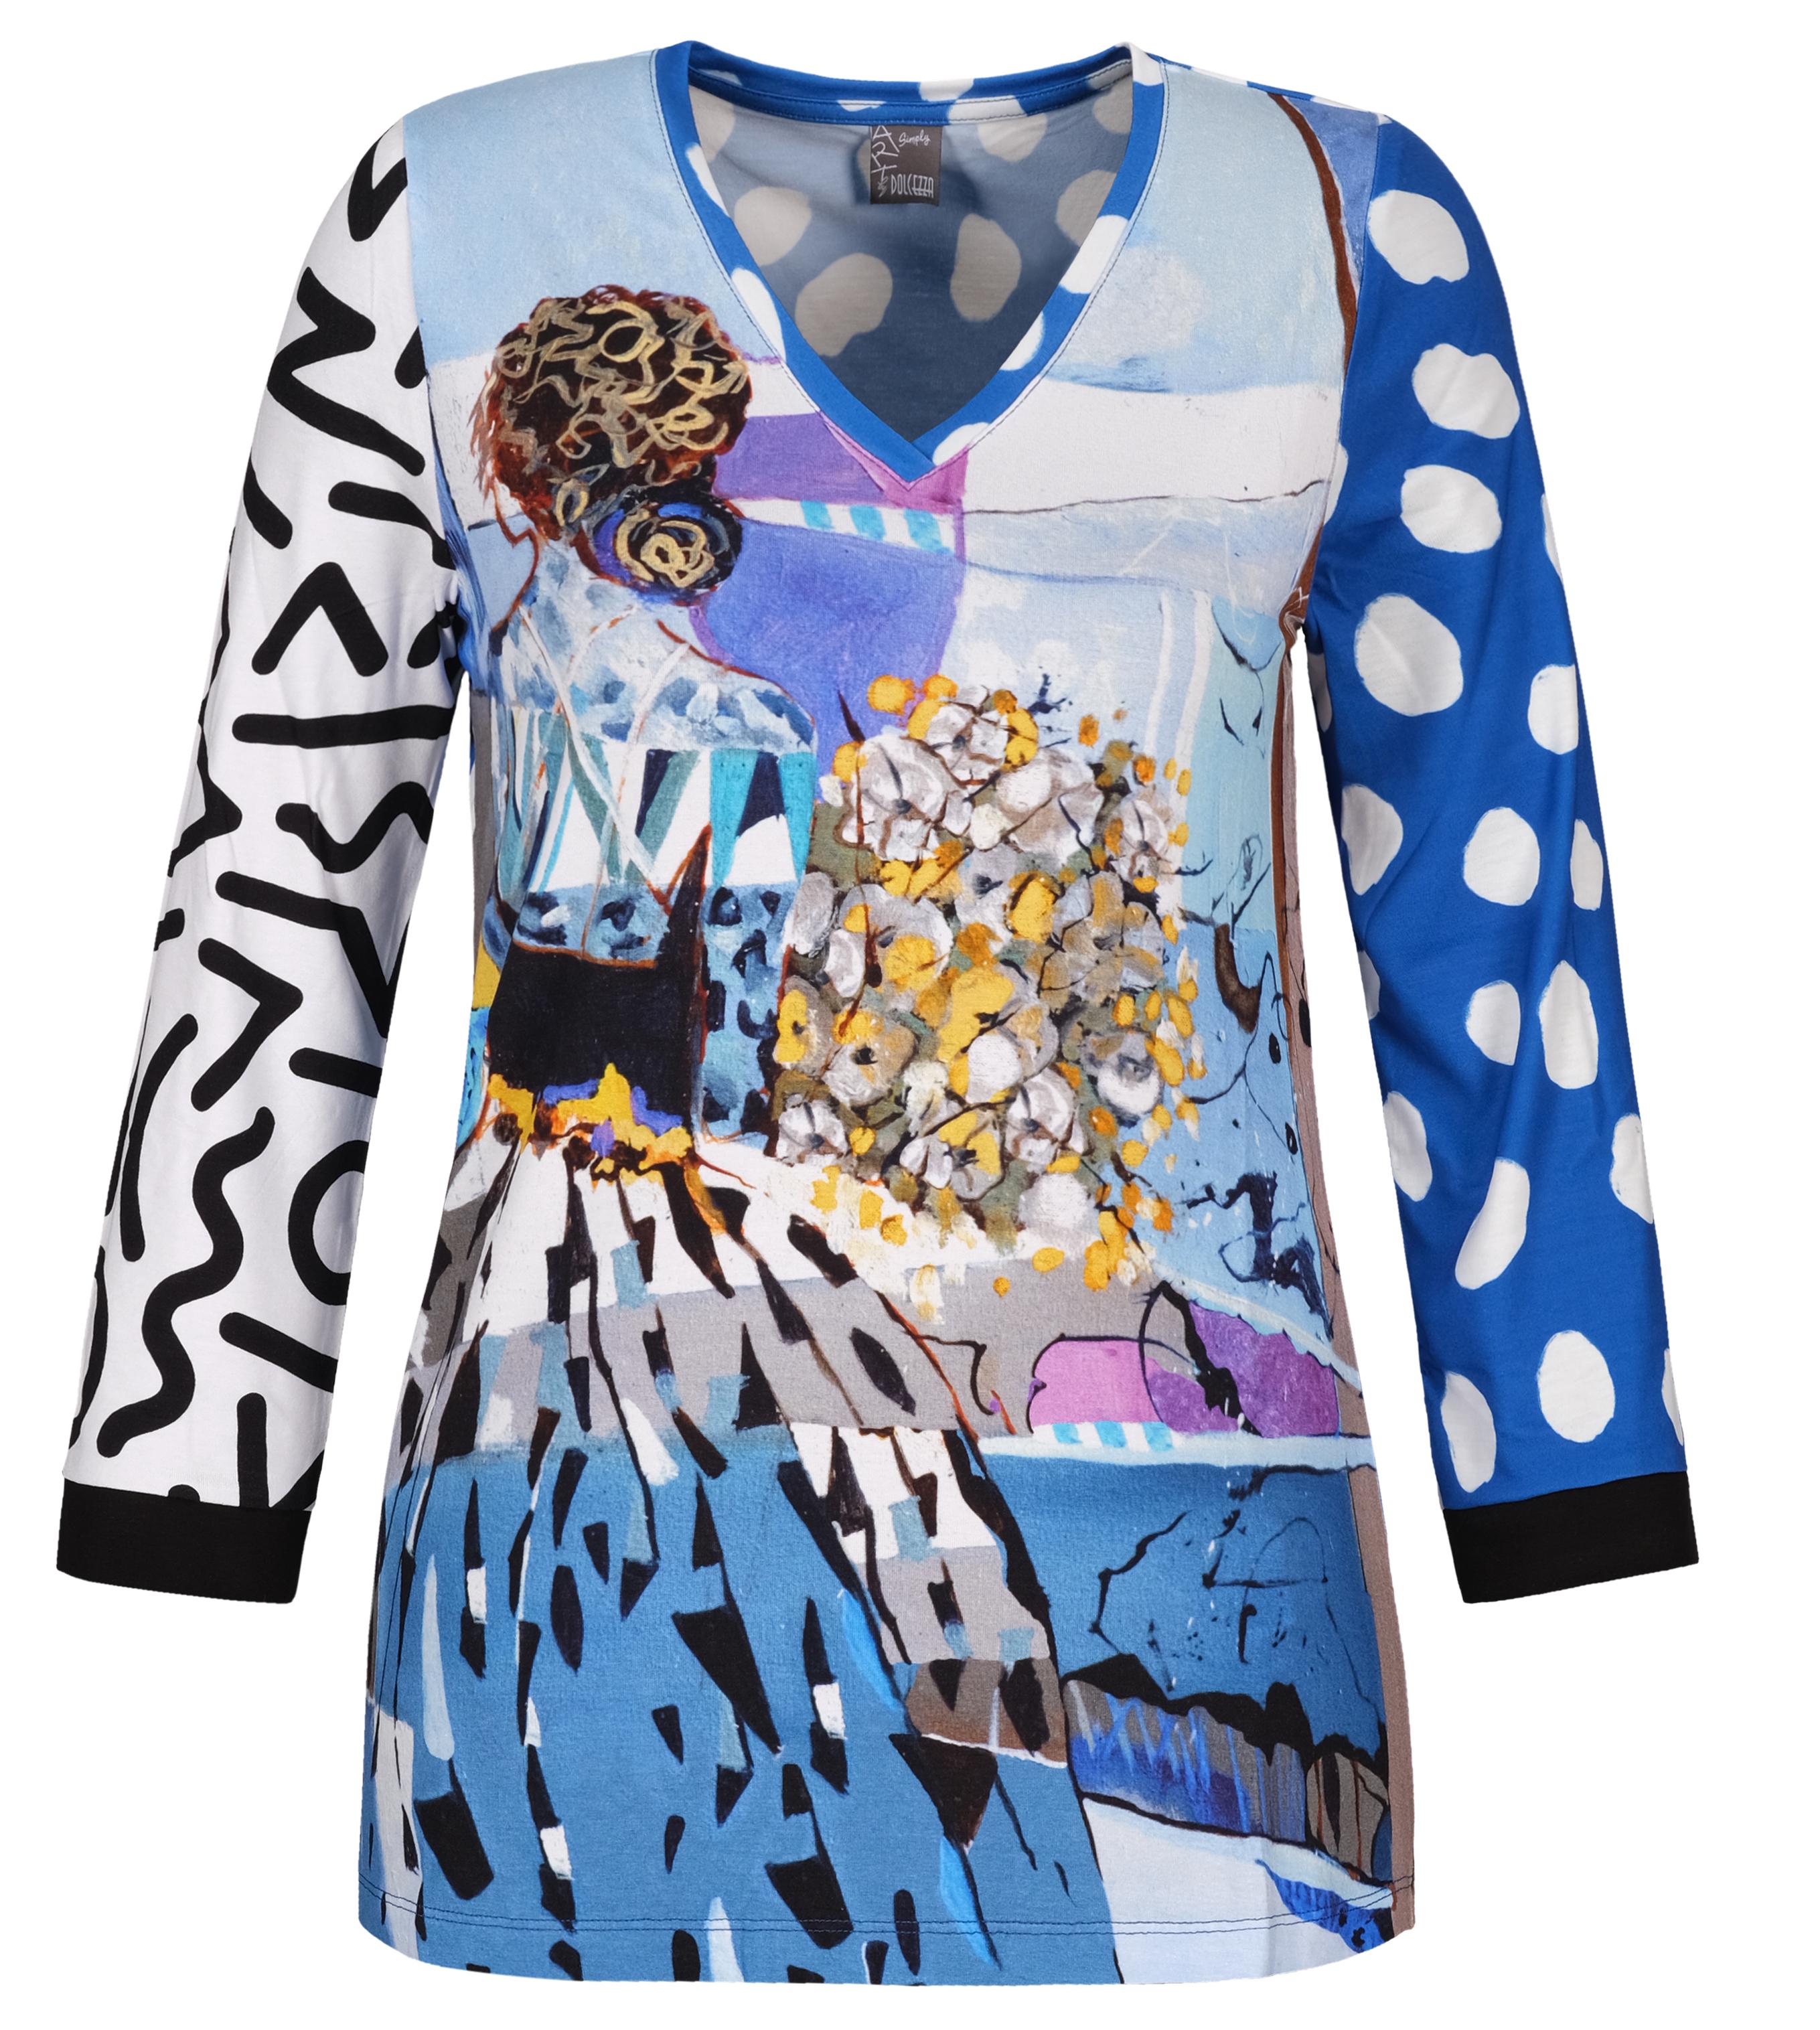 Simply Art Dolcezza: Princess Danae Abstract Art T-Shirt (Few Left!)